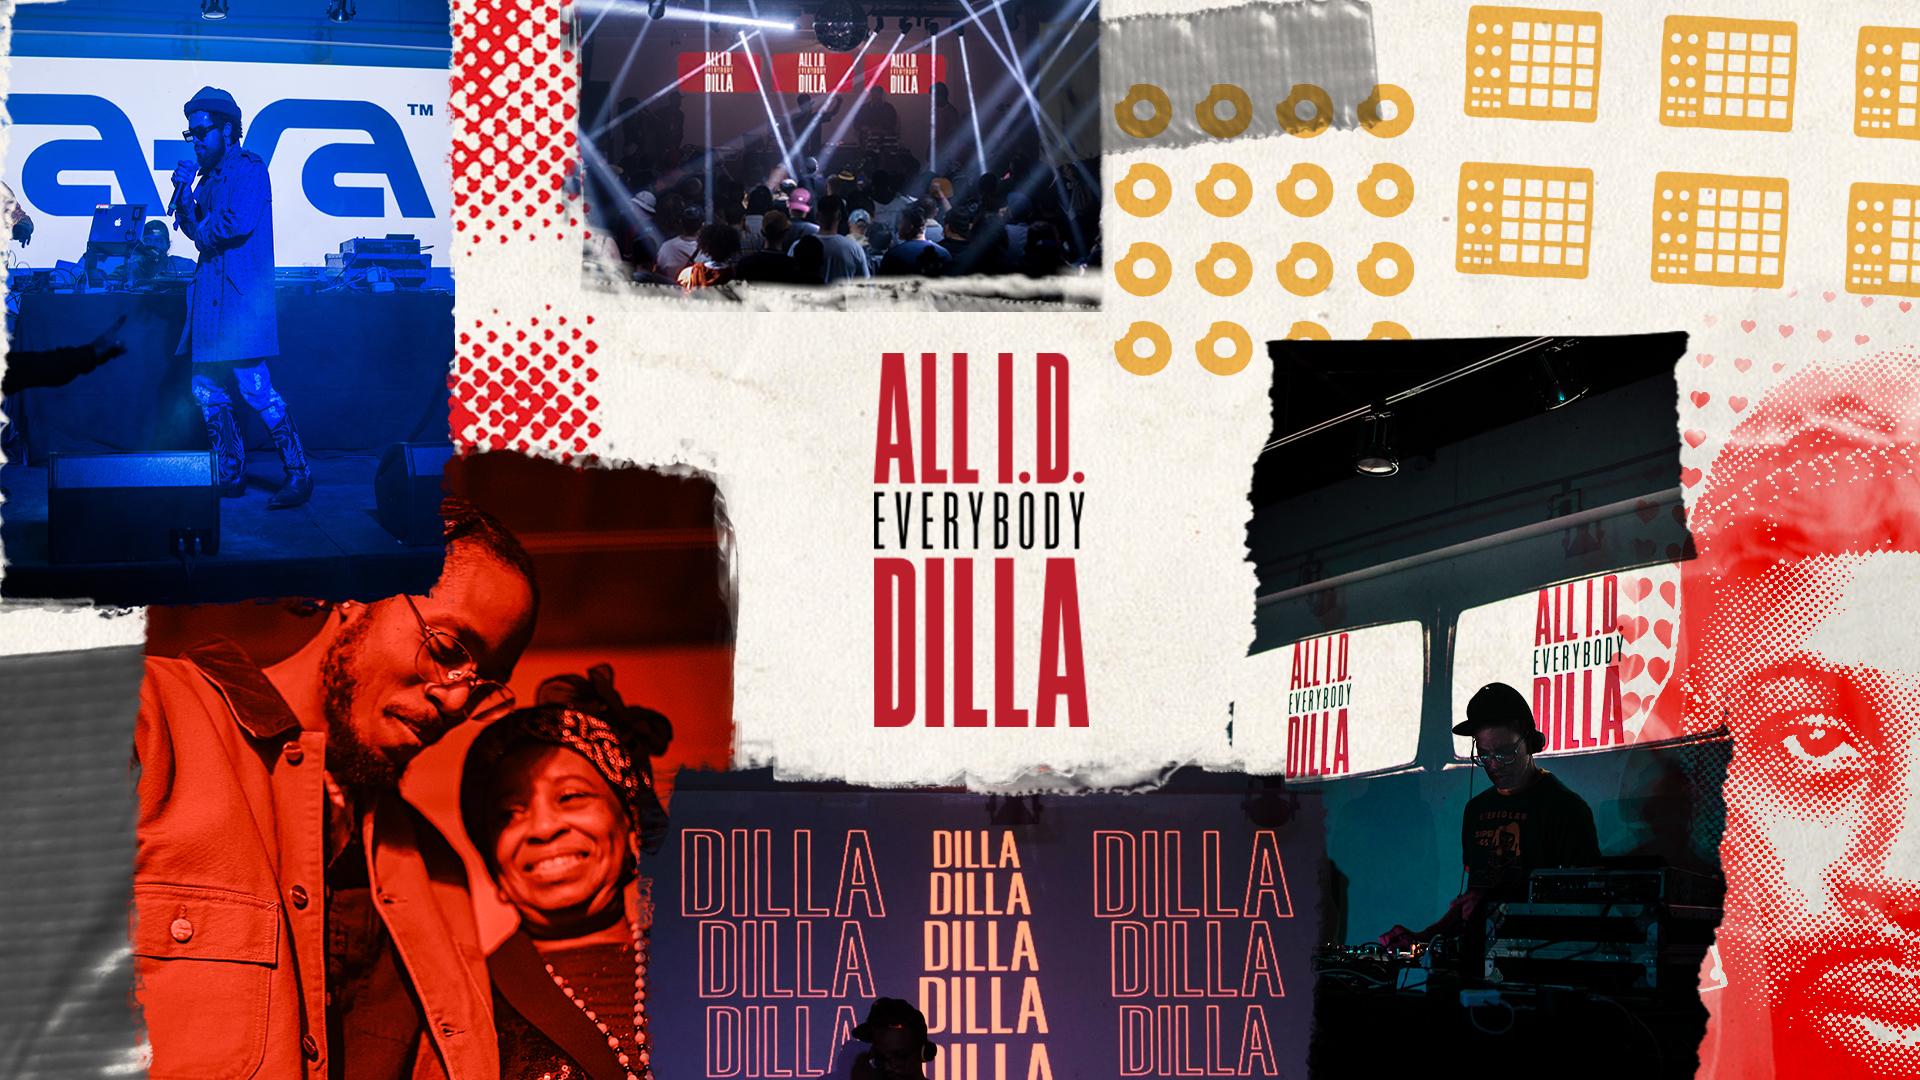 ALL.I.D. Everybody Dilla